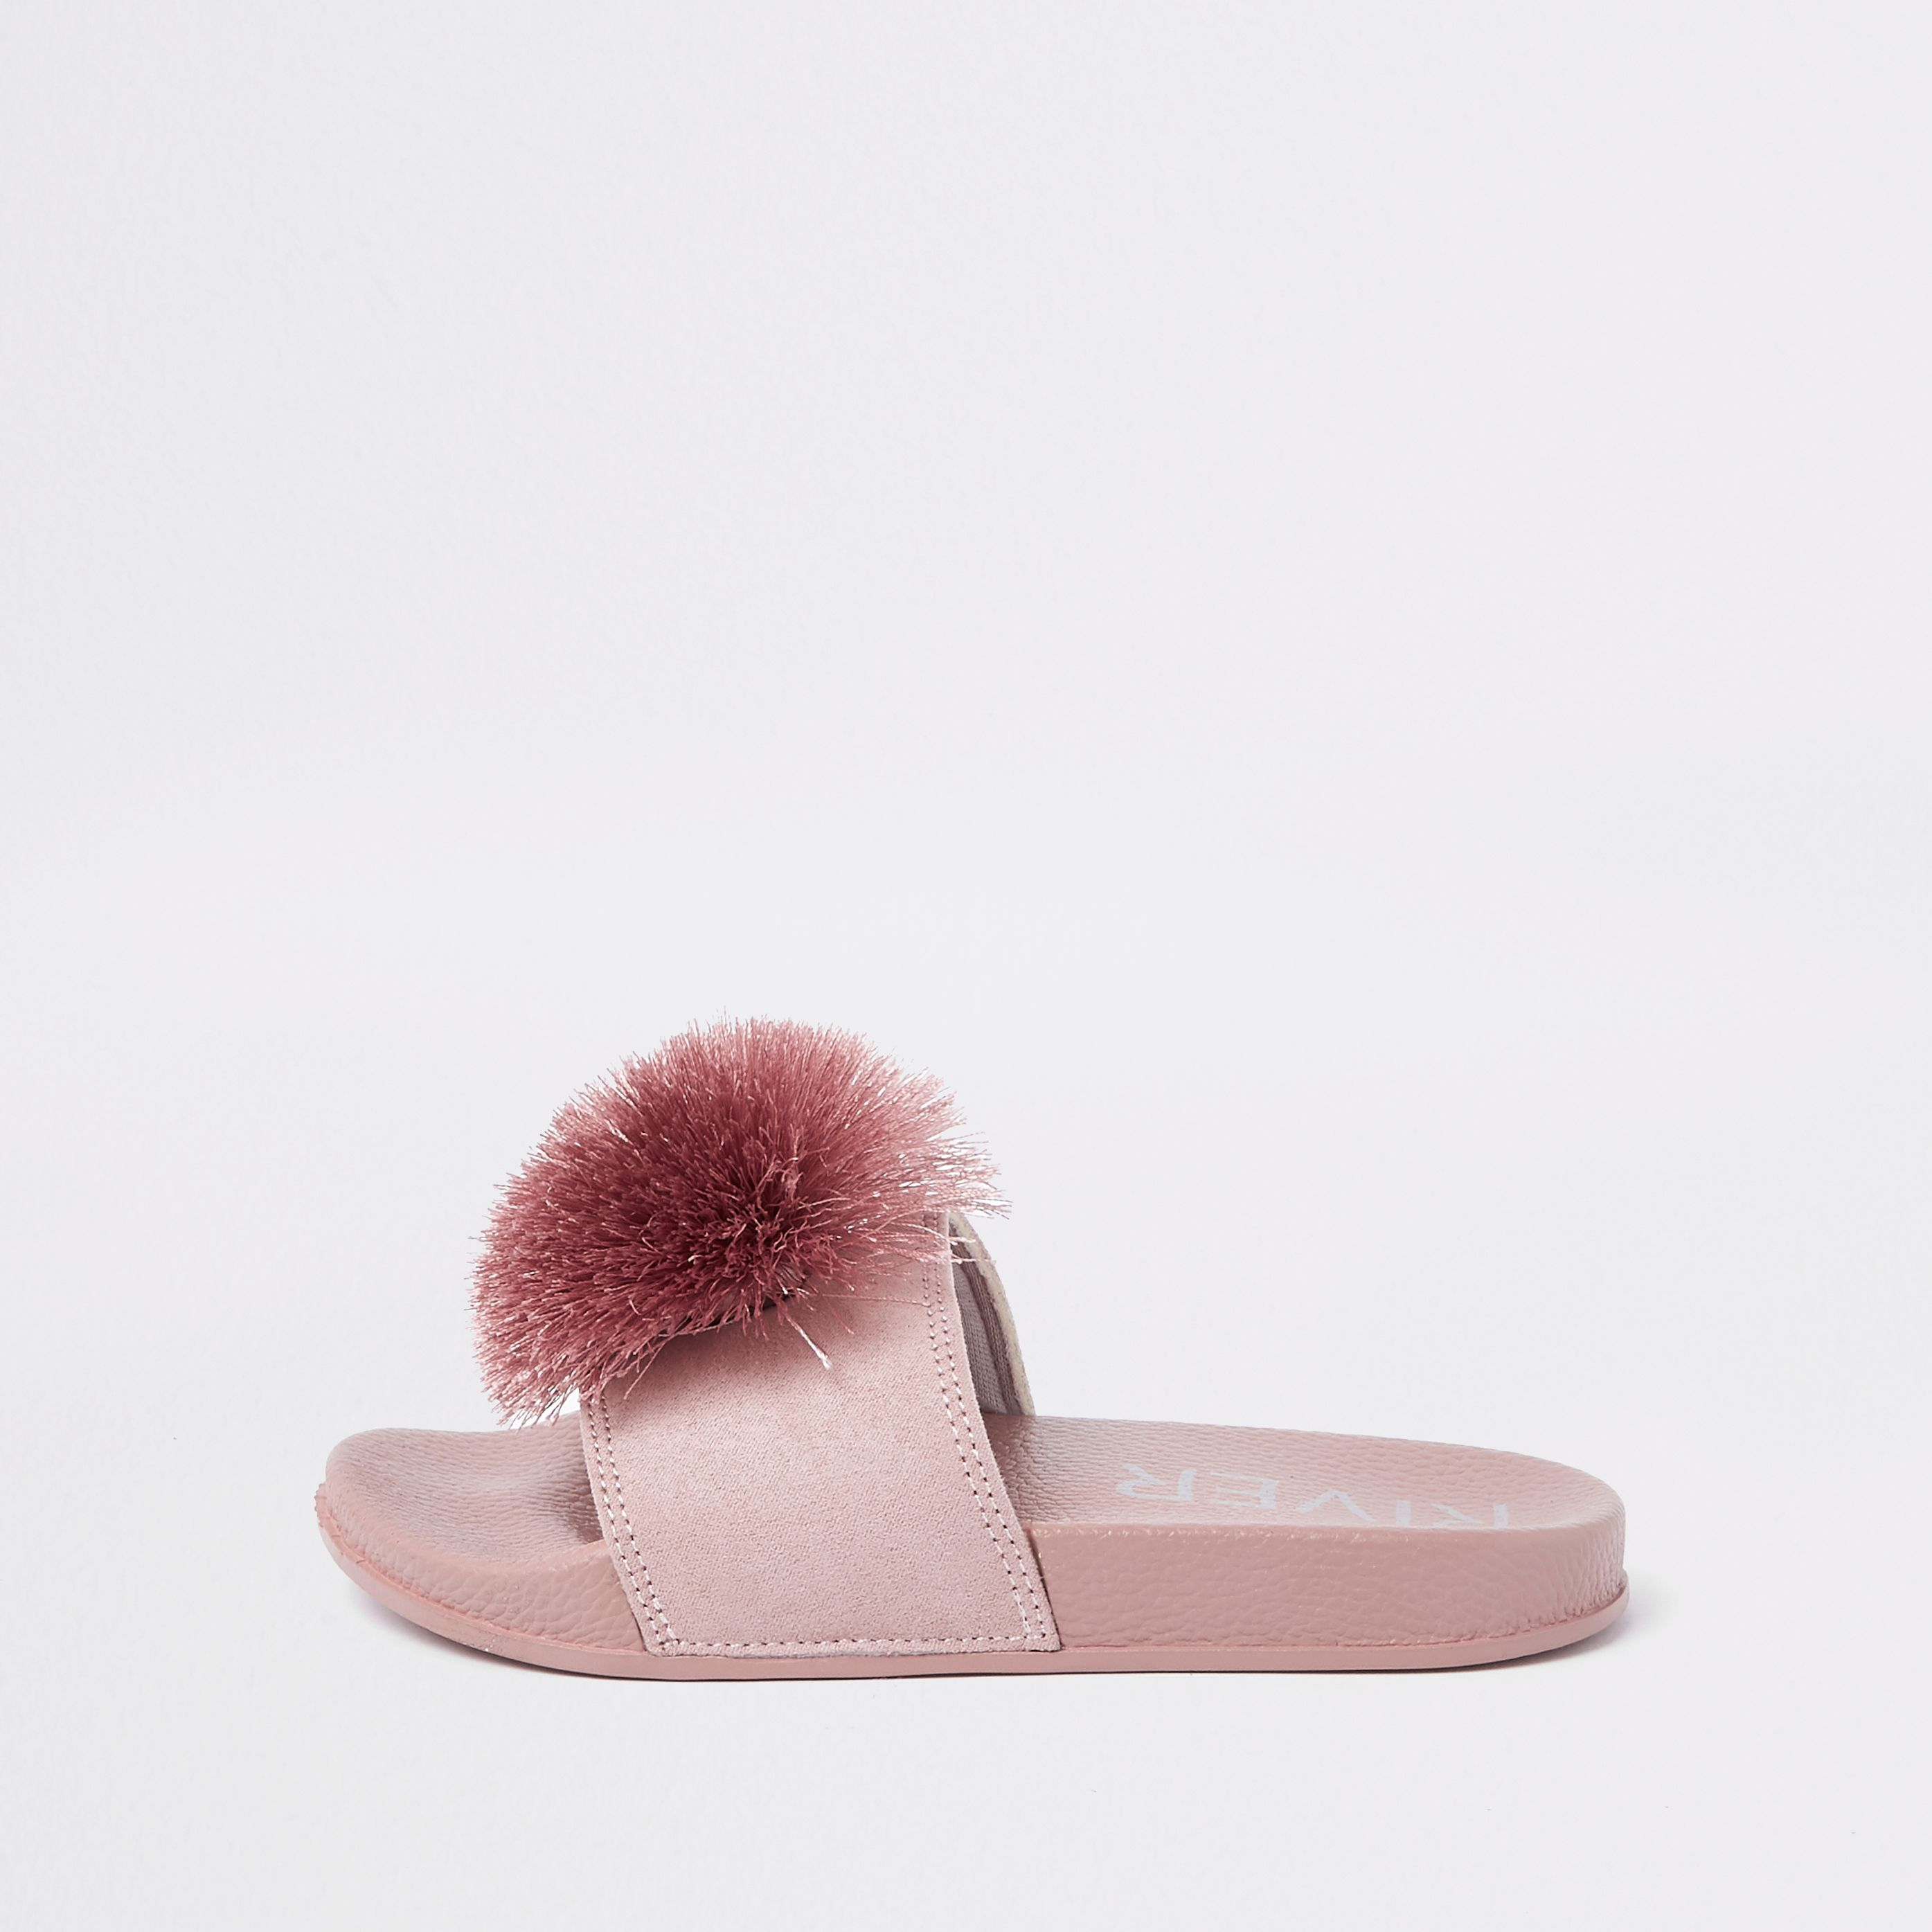 Girls pink pom pom sliders   Girls